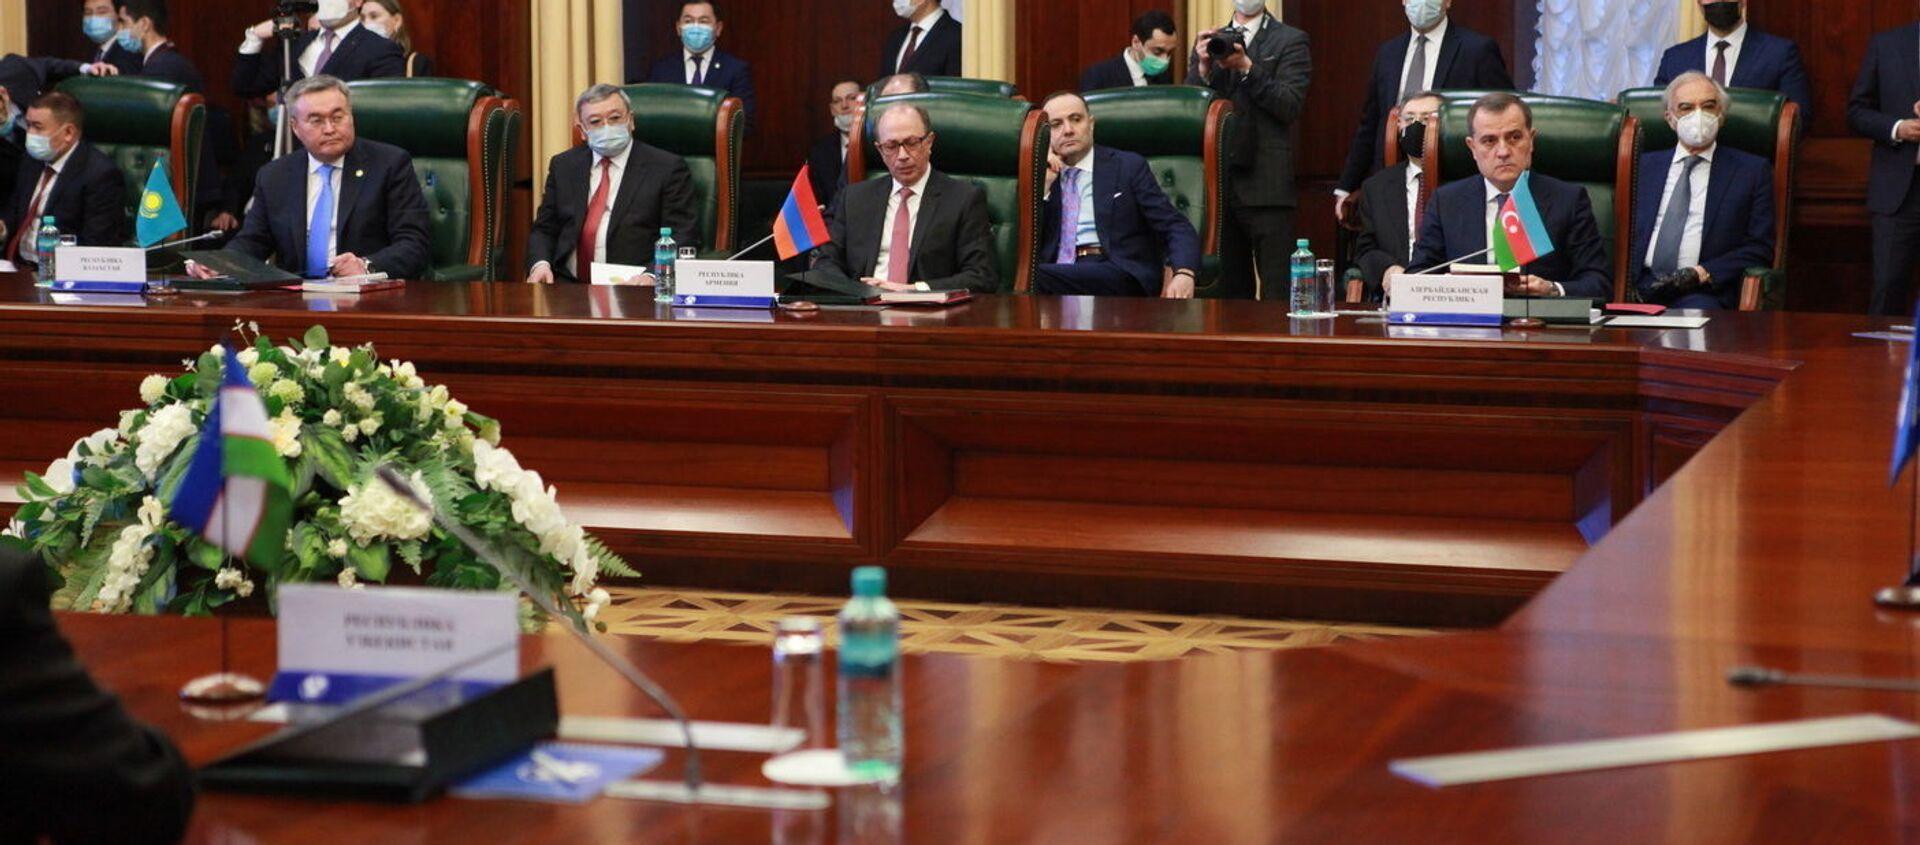 Заседание Совета глав МИД стран СНГ - Sputnik Азербайджан, 1920, 02.04.2021